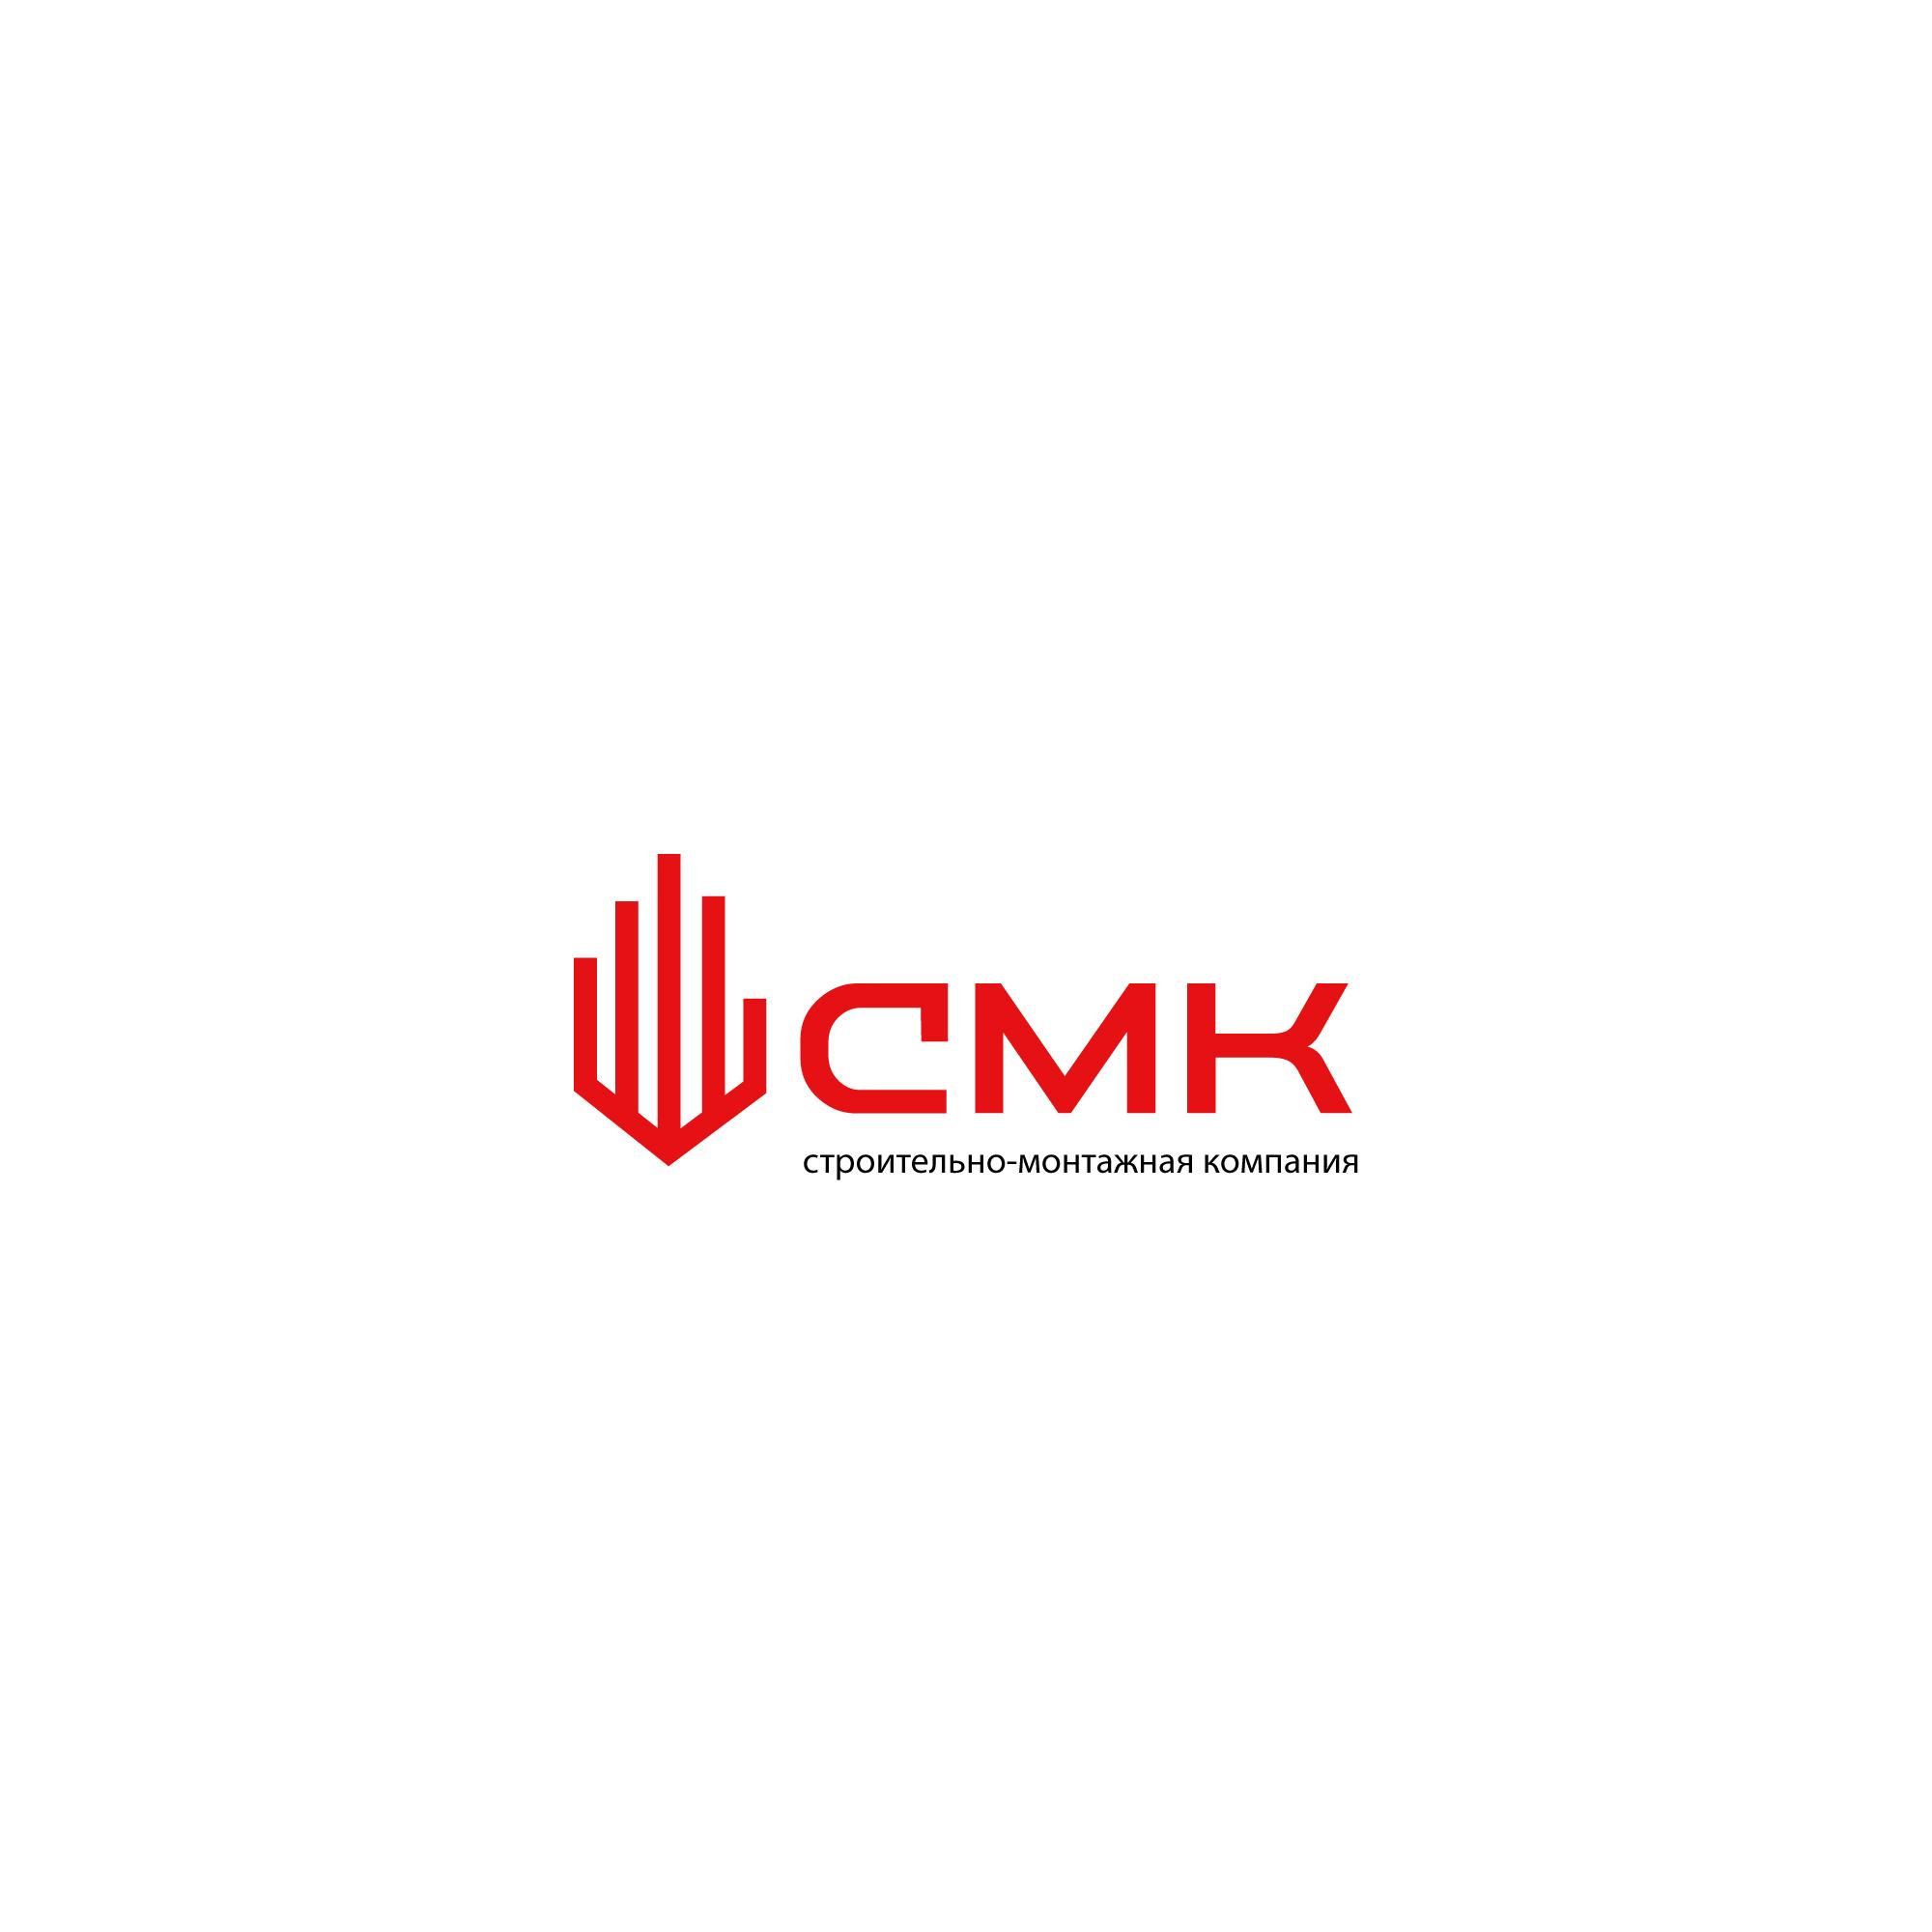 Разработка логотипа компании фото f_0255dd42636eb24c.jpg